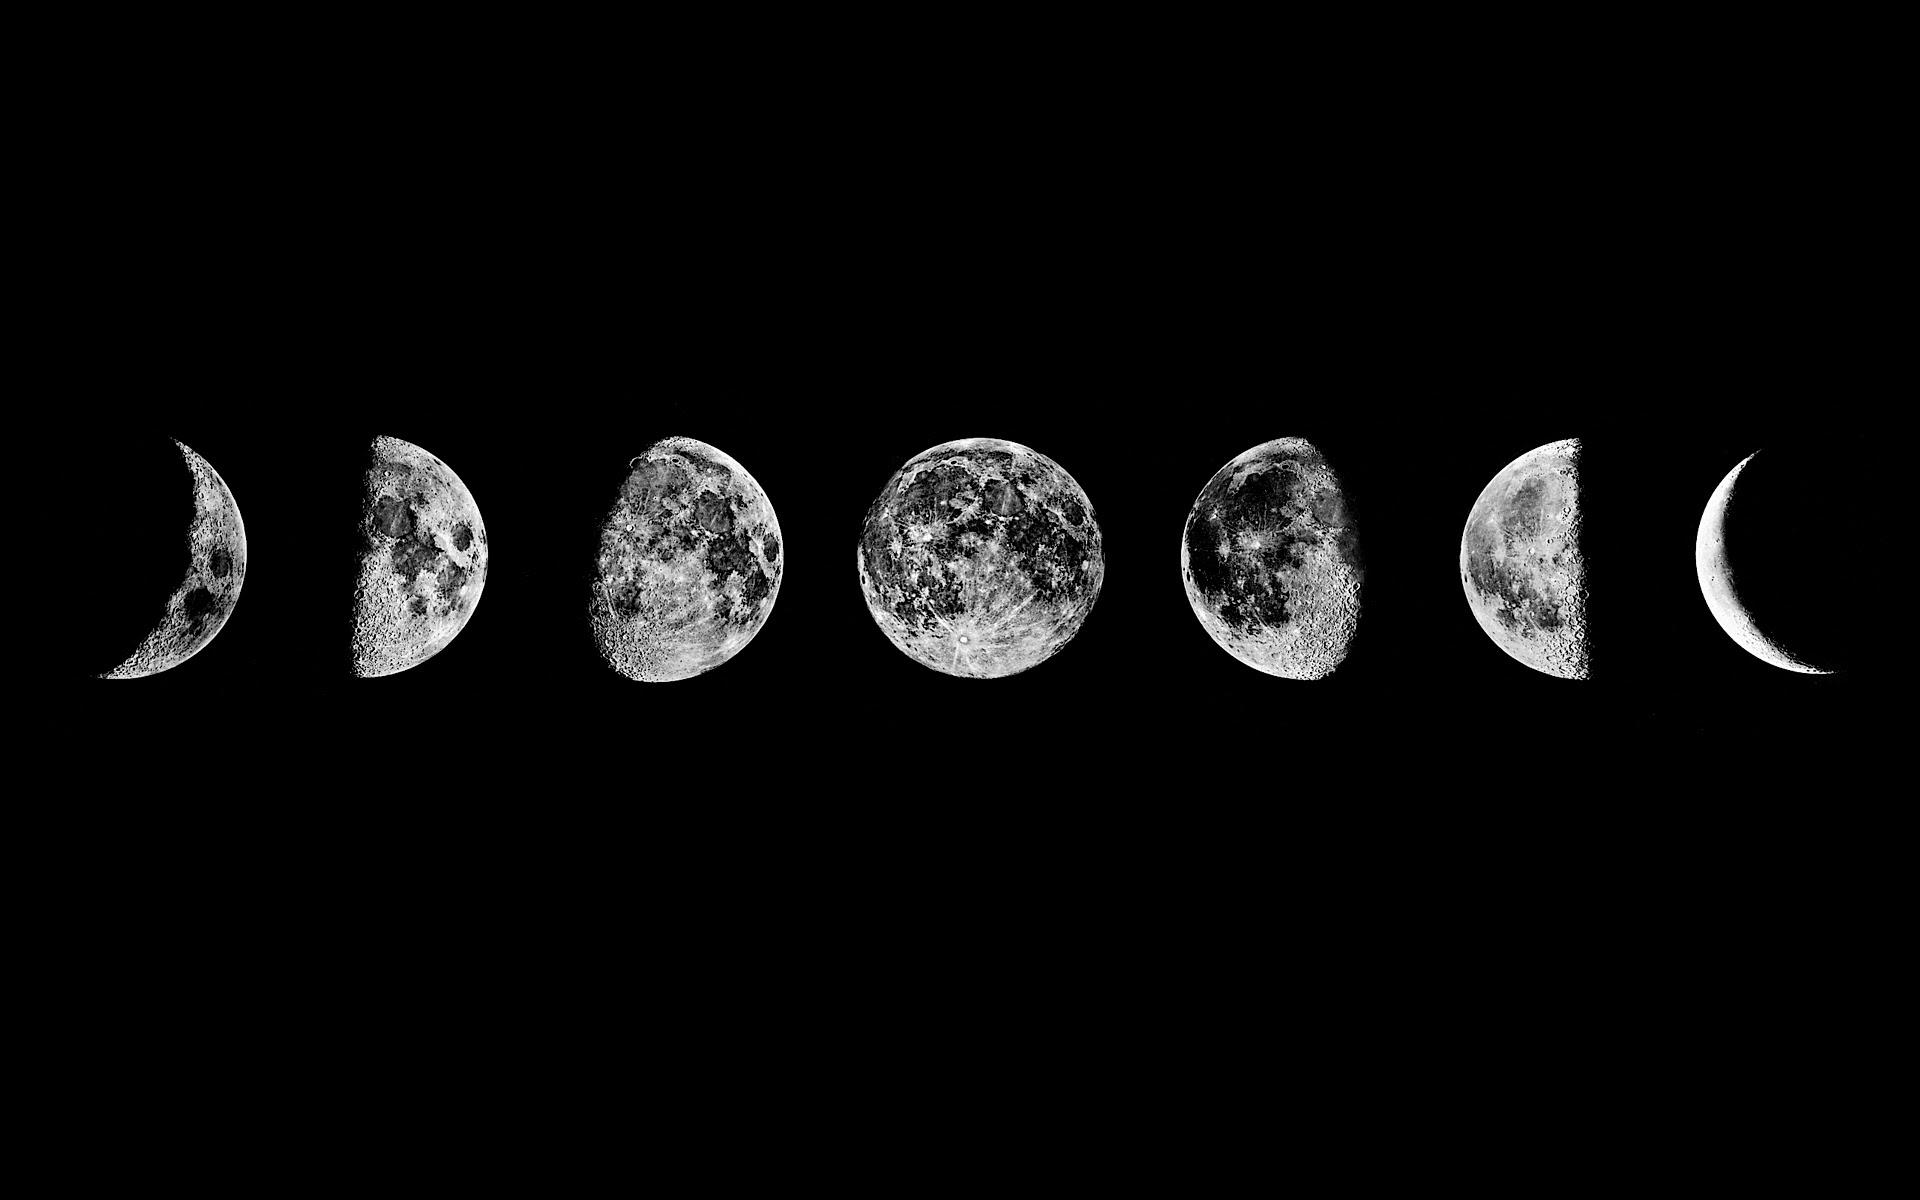 cute, iphone wallpaper, moon, moon phases, tumblr, wallpaper  image 1879062 by taraa on Favim.com